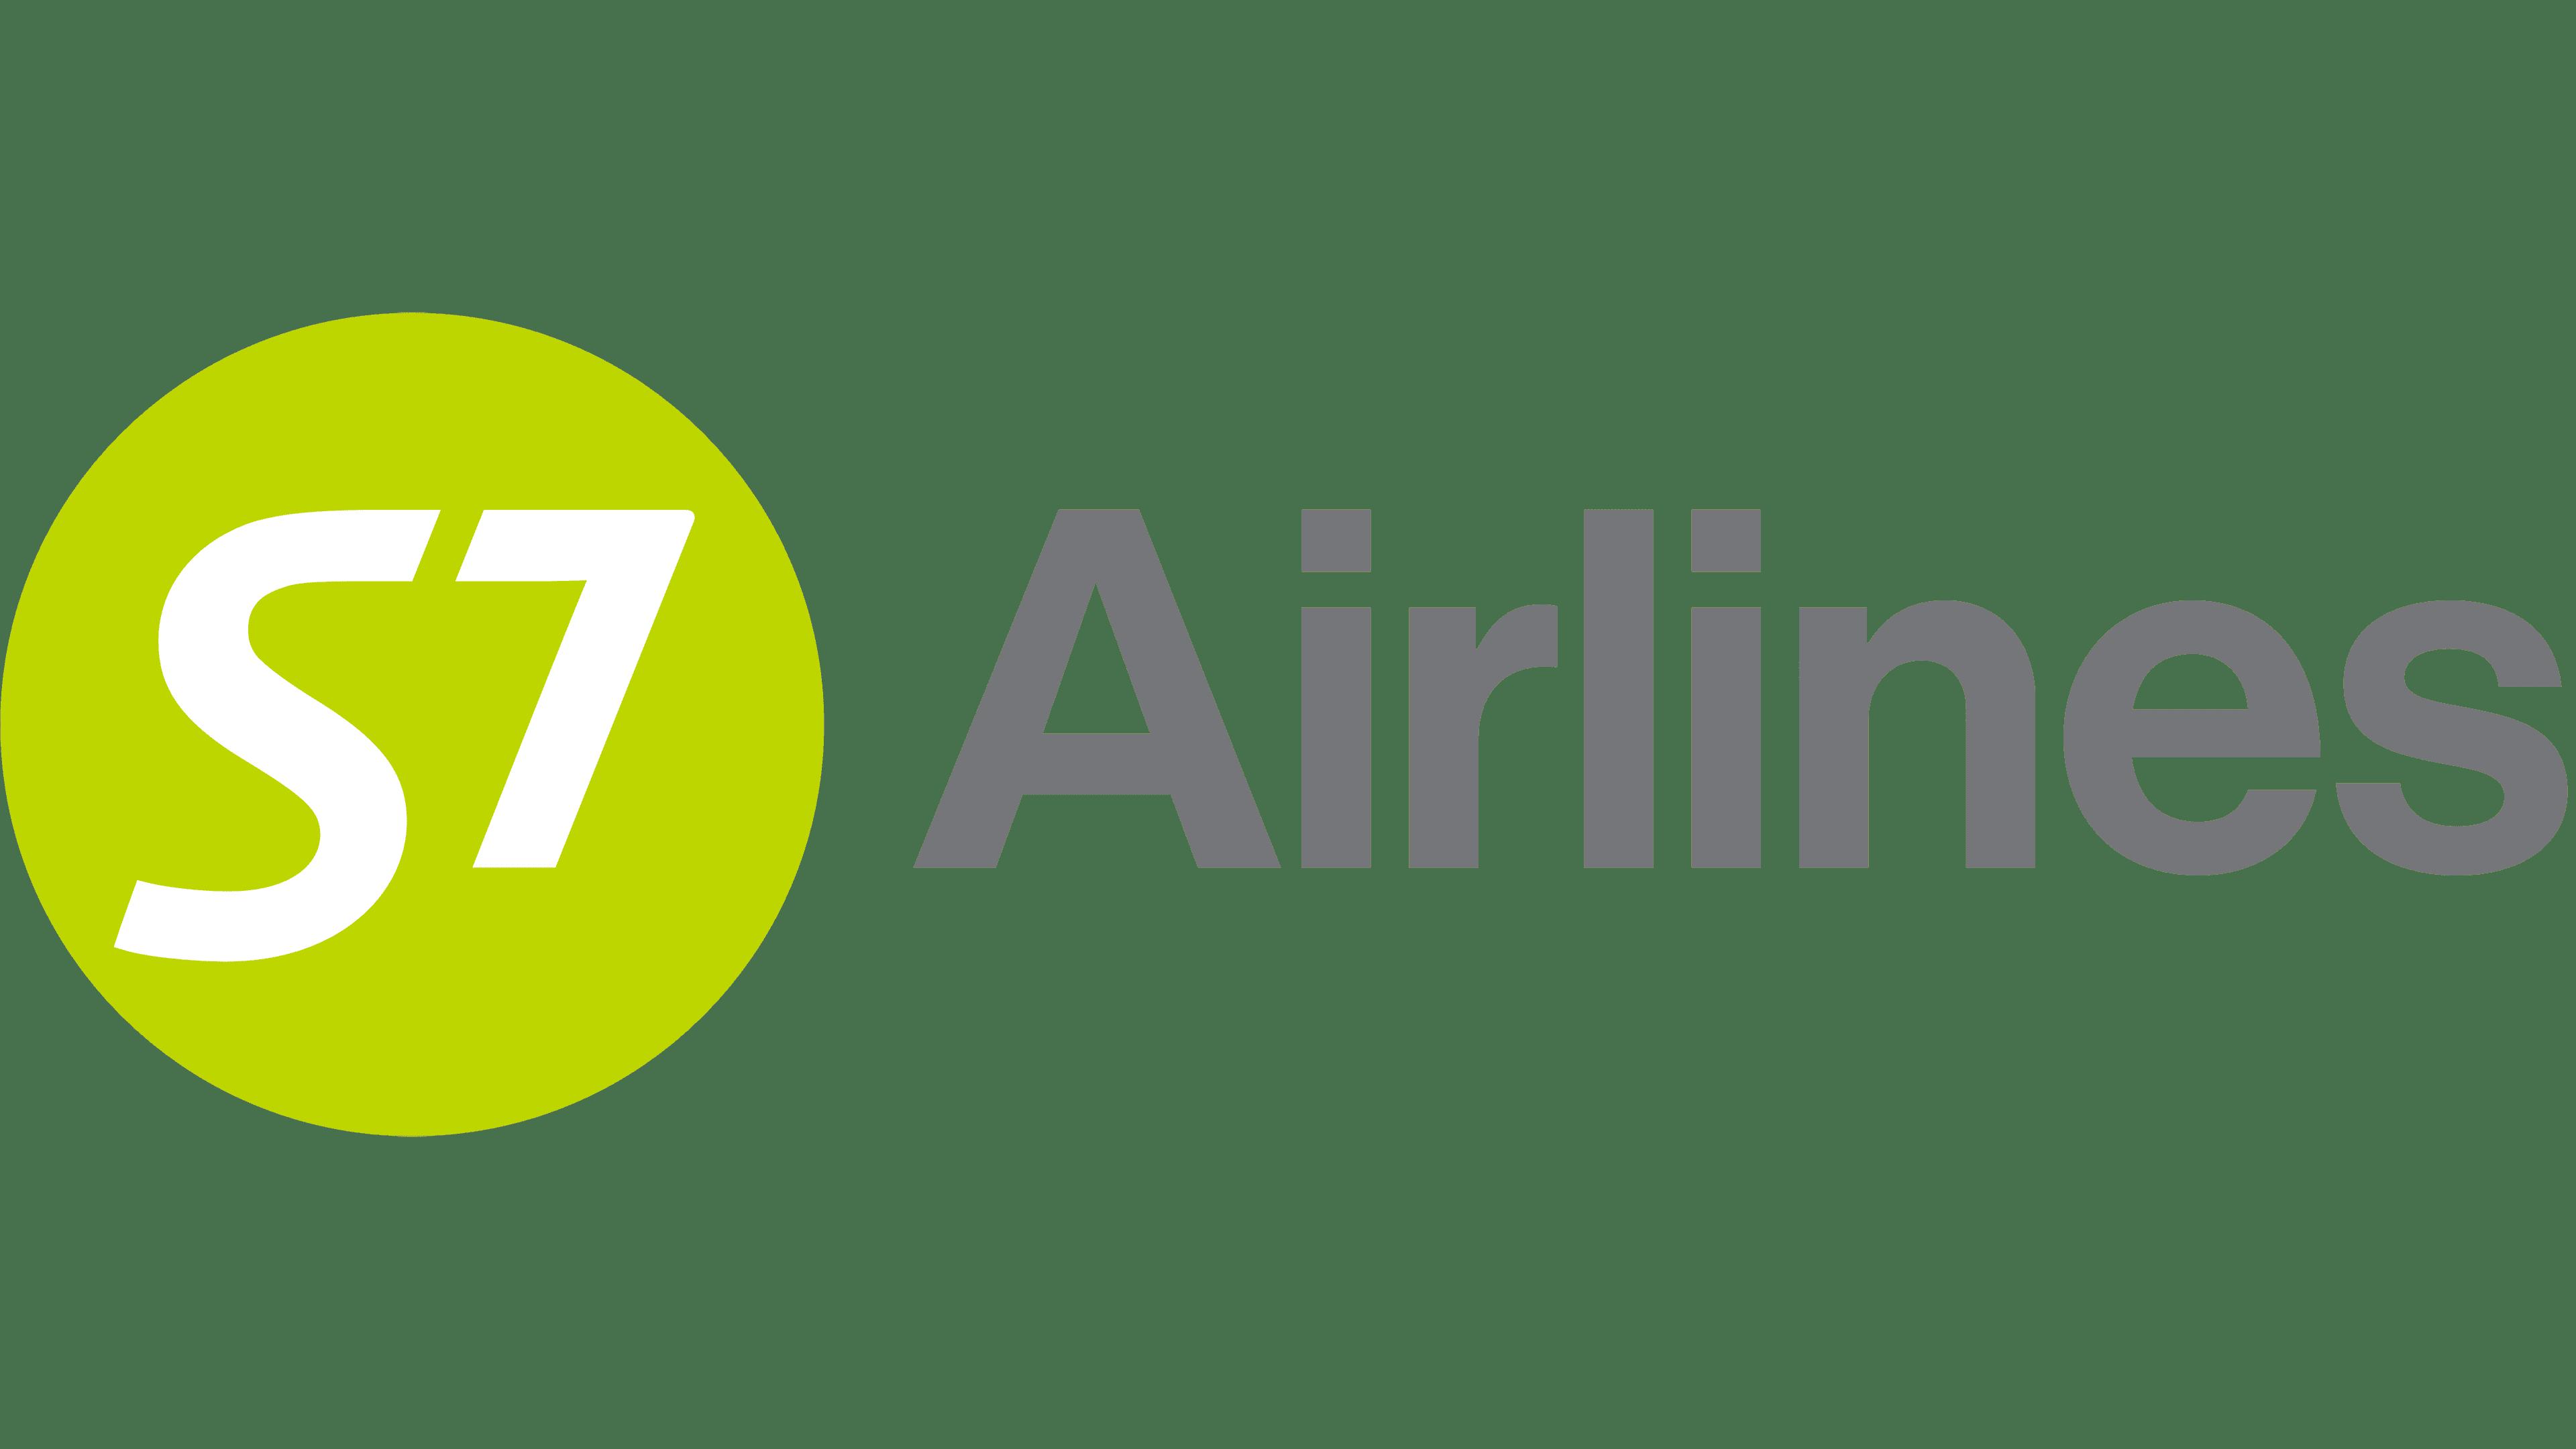 S7 Airlines Logo Logo